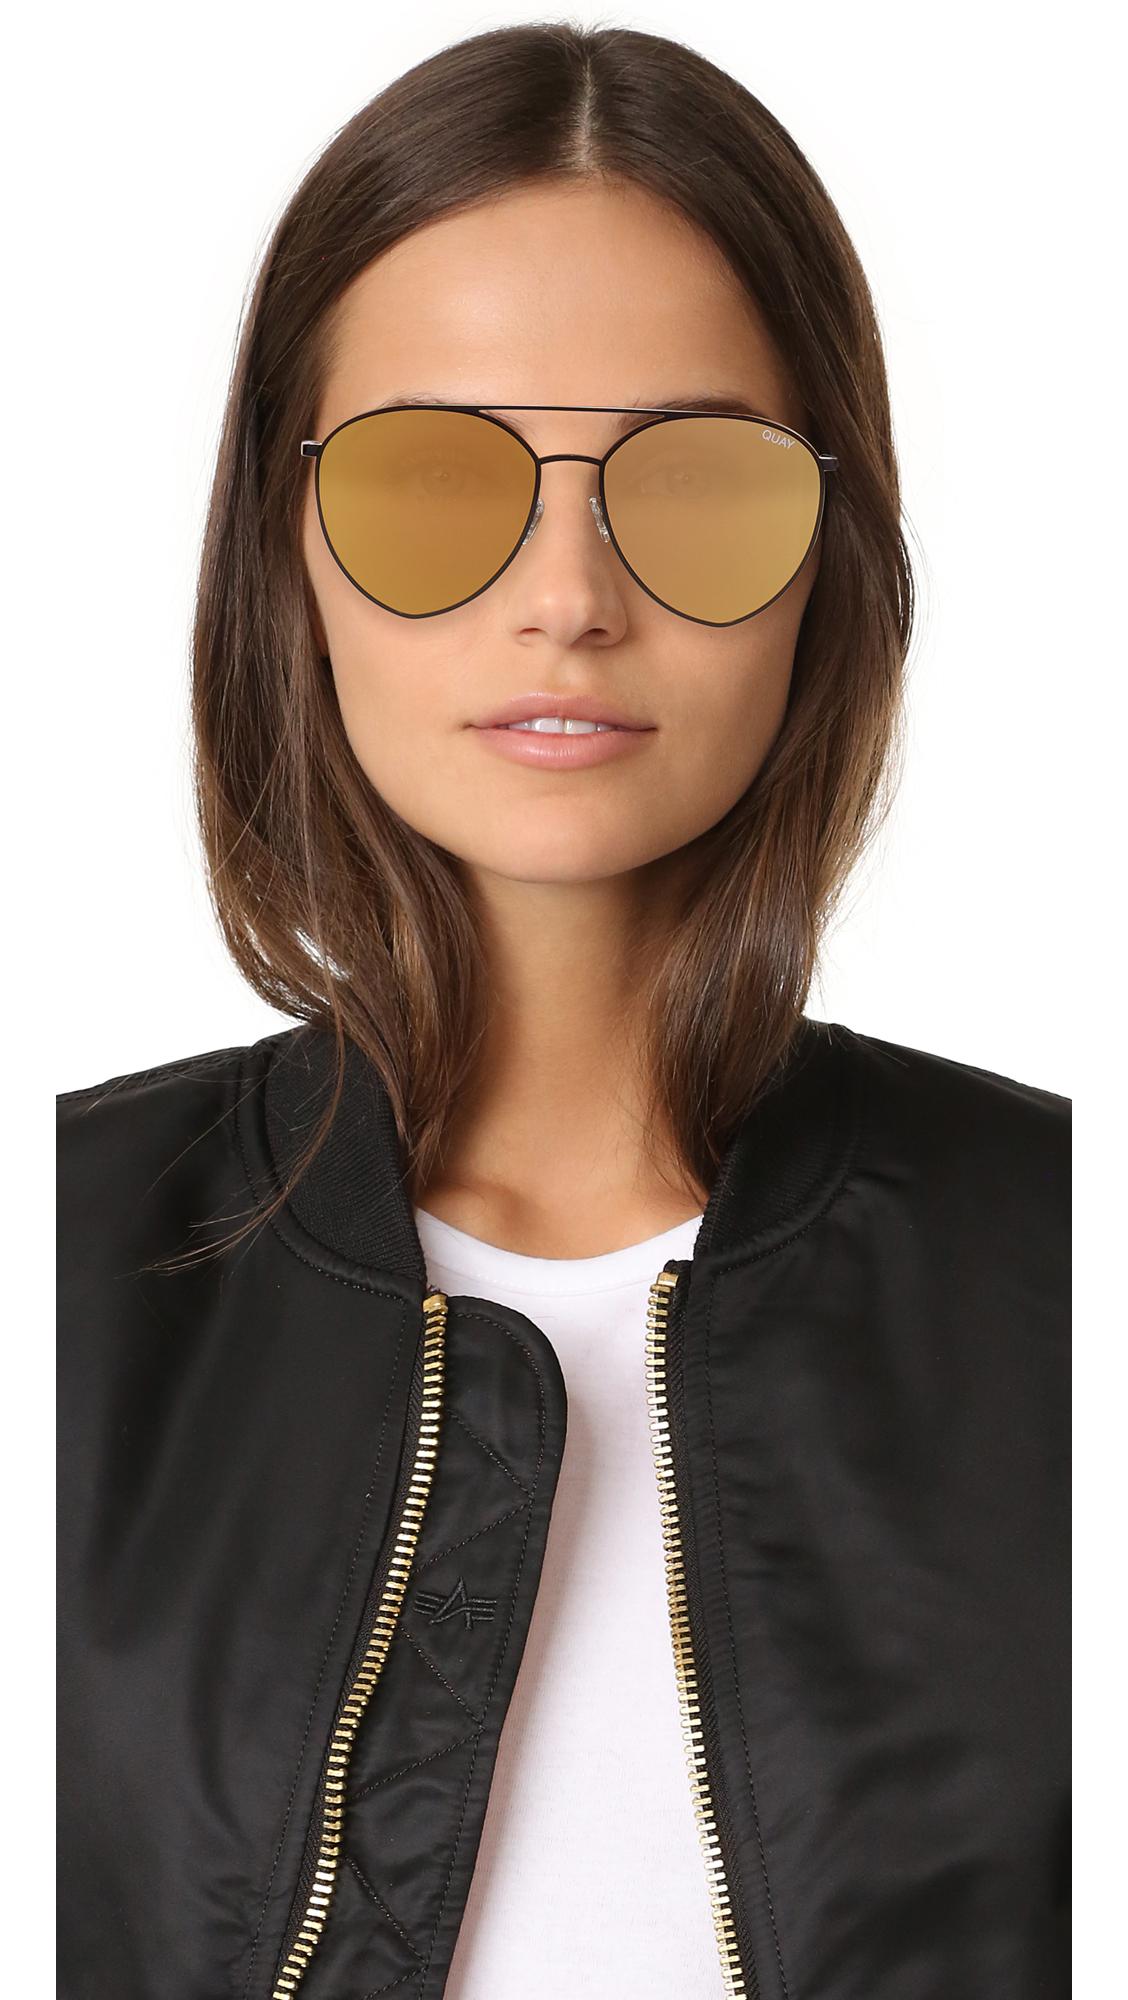 3f3ab27e22 Quay x Jasmine Sanders Indio Sunglasses